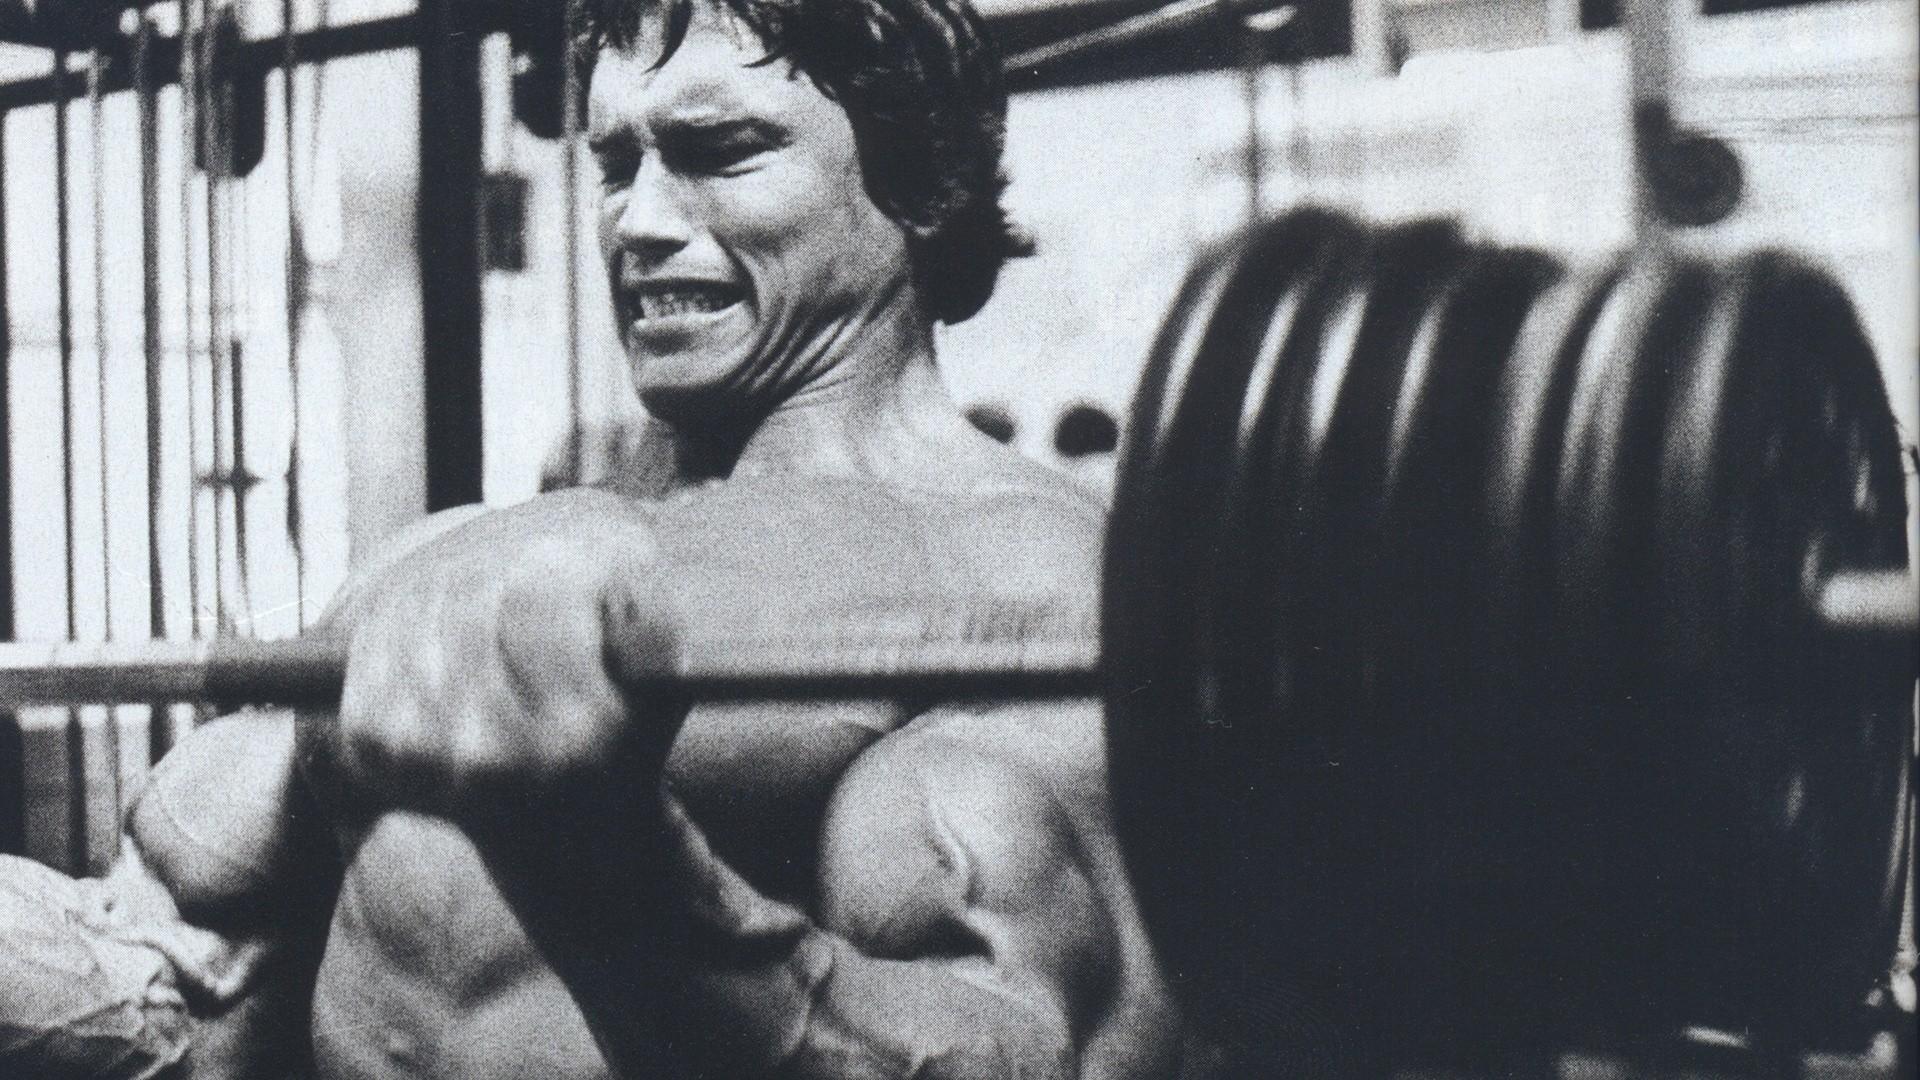 Arnold Schwarzenegger Work Out HD Wallpapers